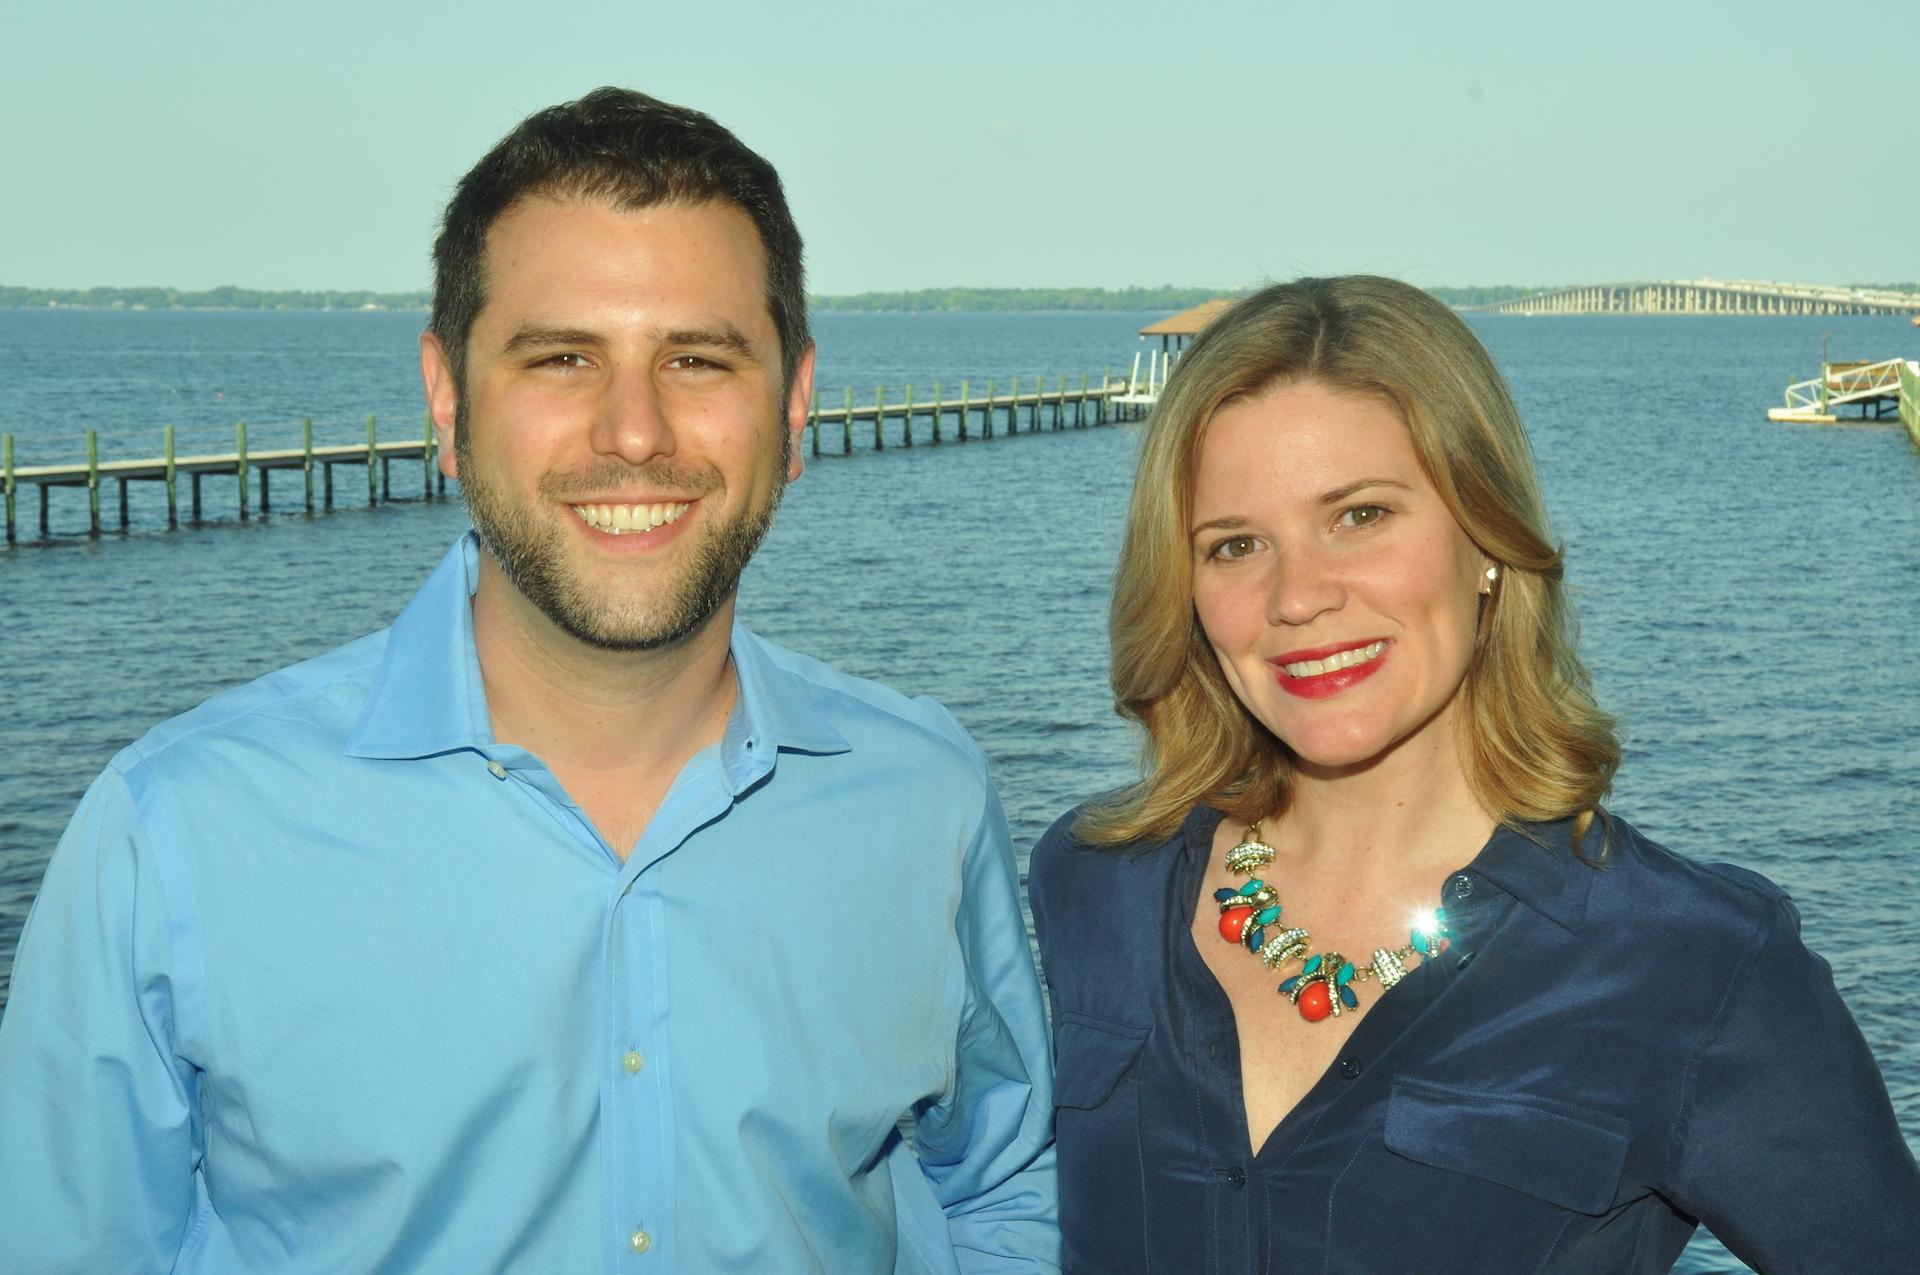 Will Landay & Rachael Ridaught